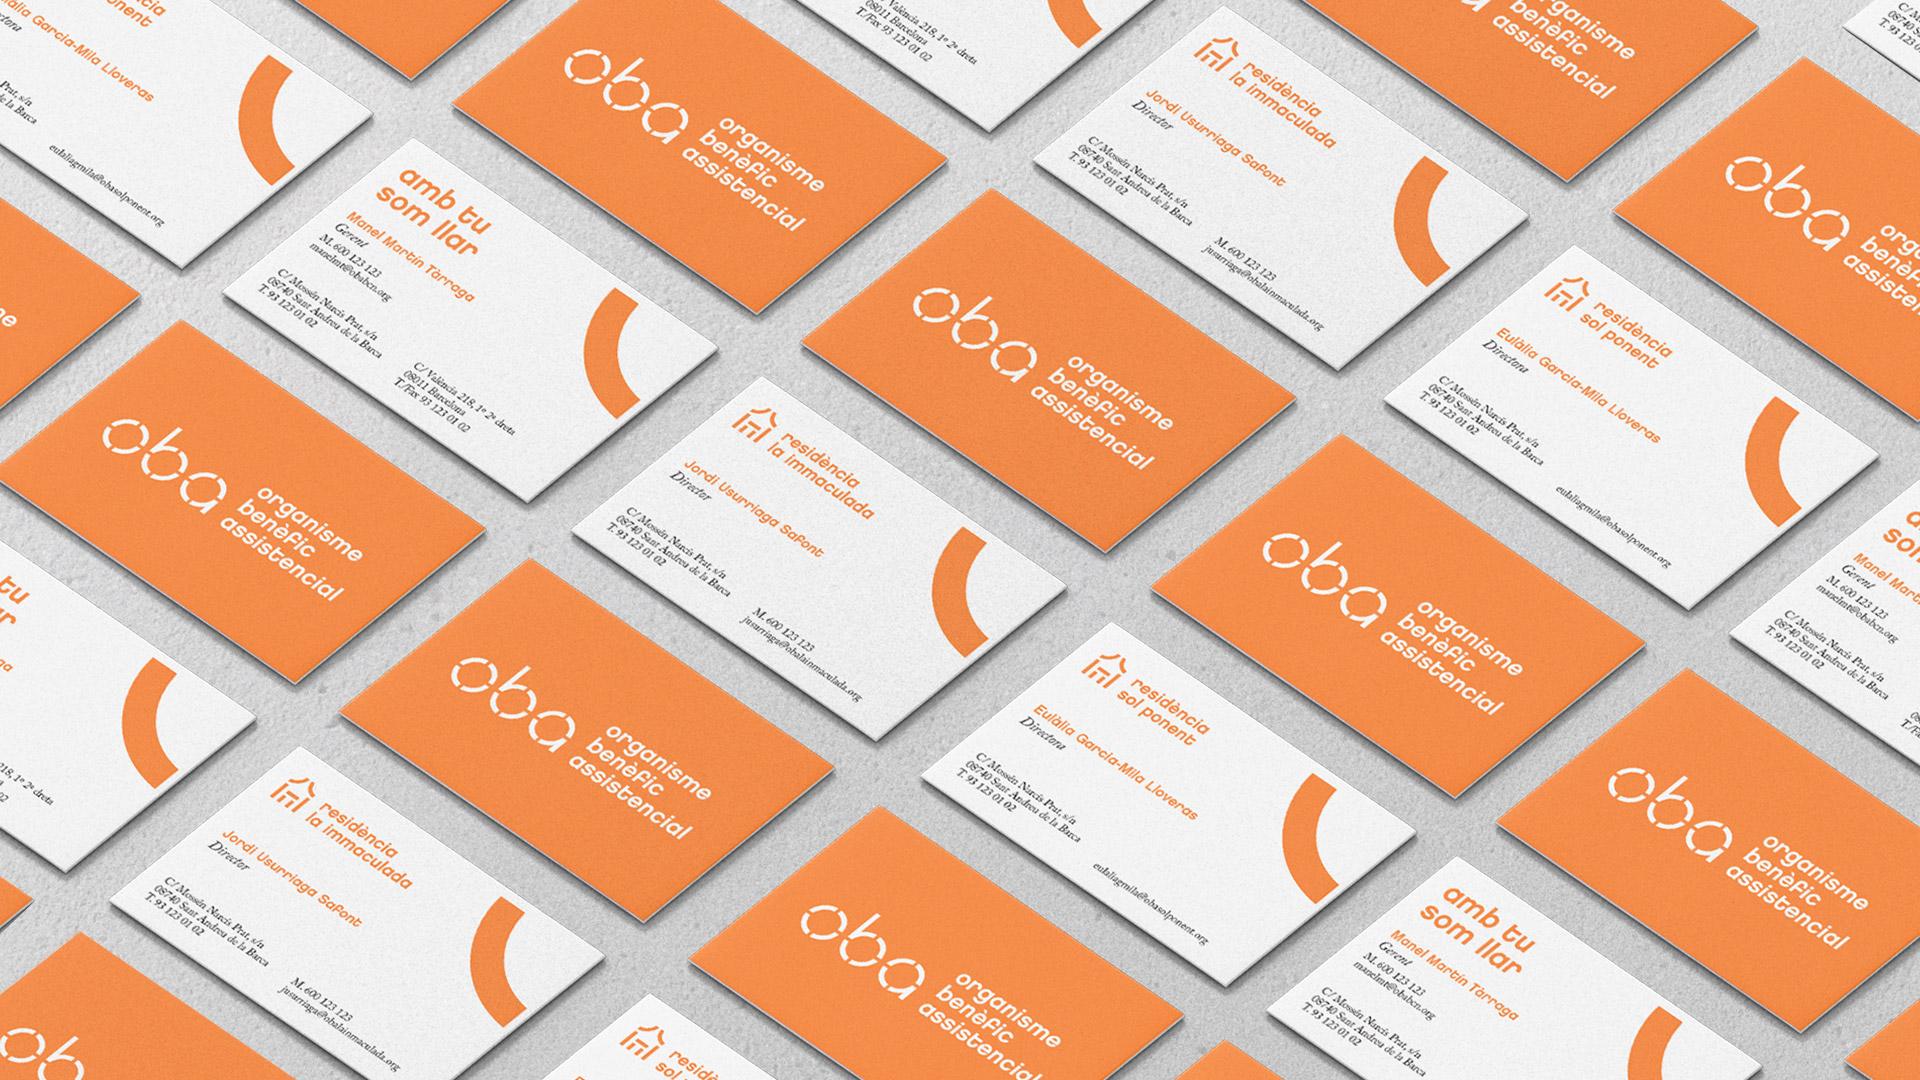 sara-quintana-branding-identidad-logo-diseno-direccion-arte-ong-modular-dinamico-marca--tarjetas-visita-02